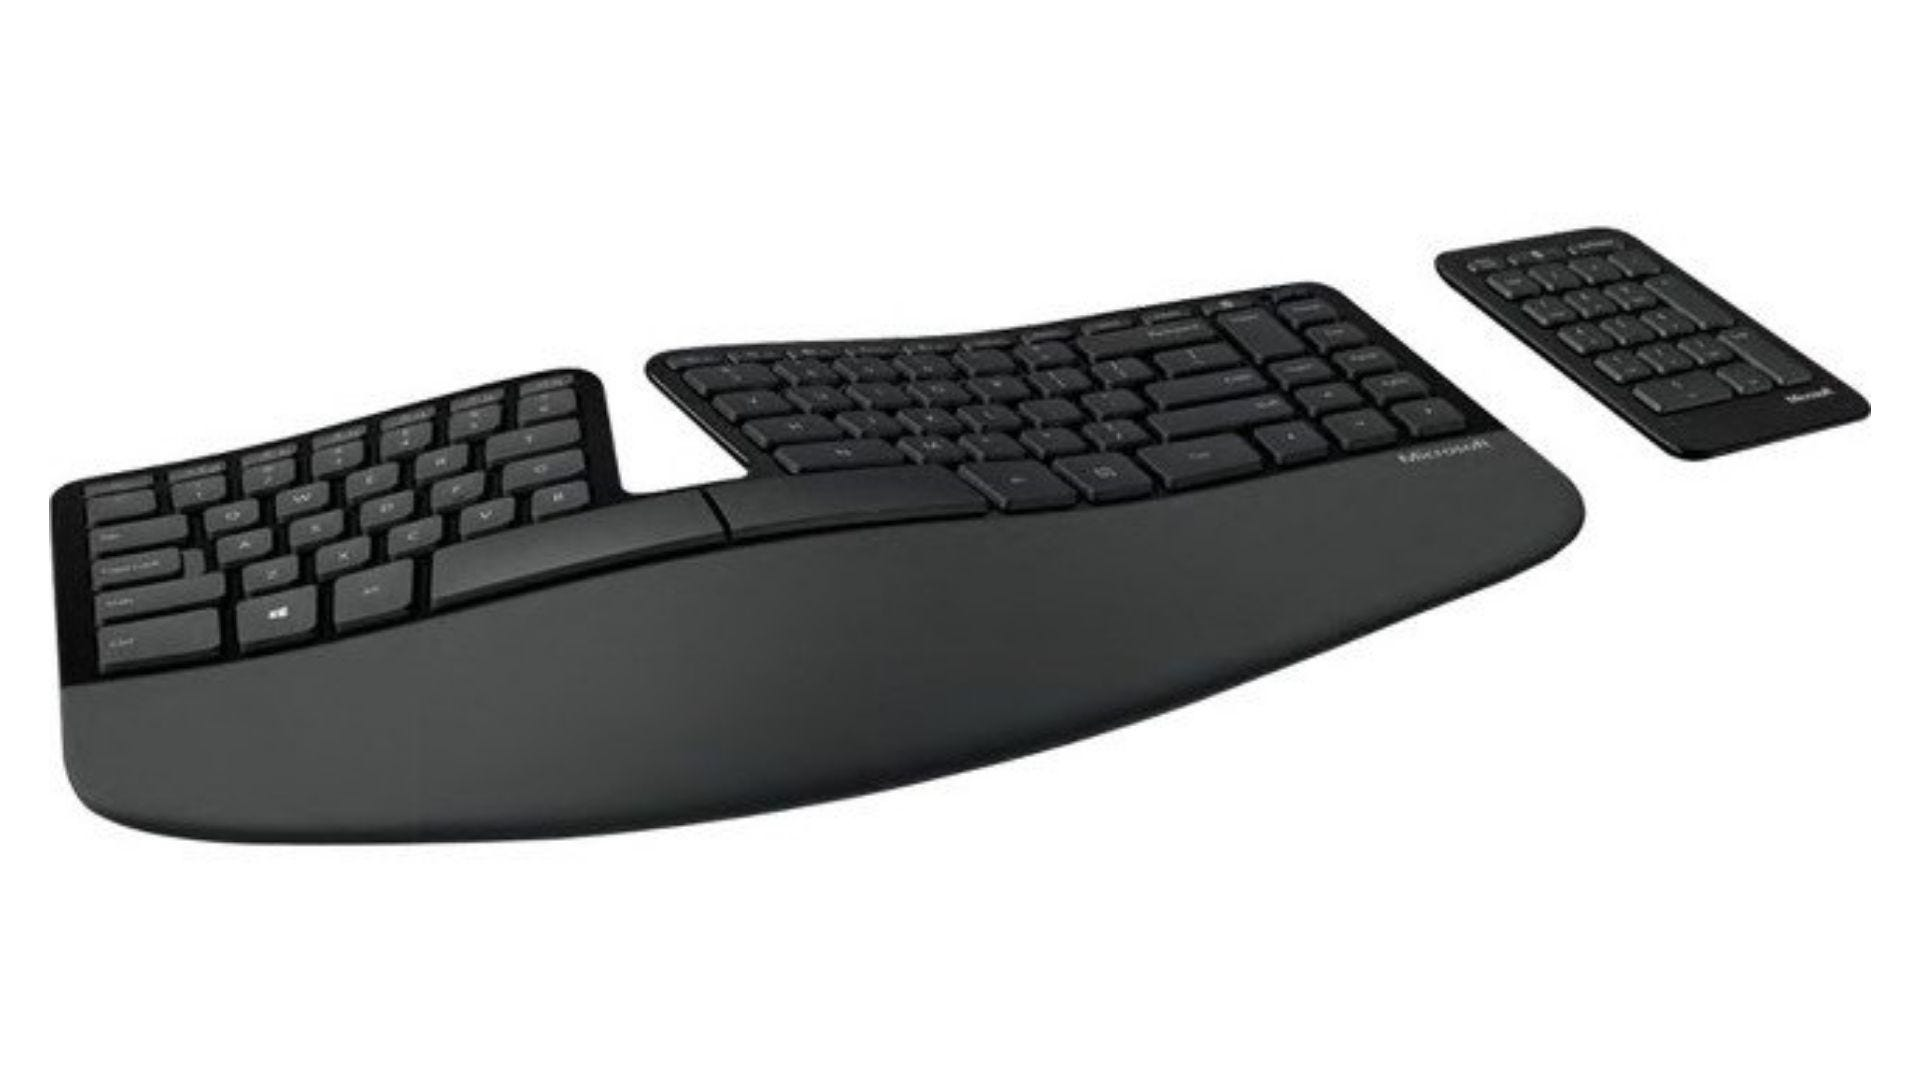 Microsoft Sculpt Ergonomic Keyboard For Business